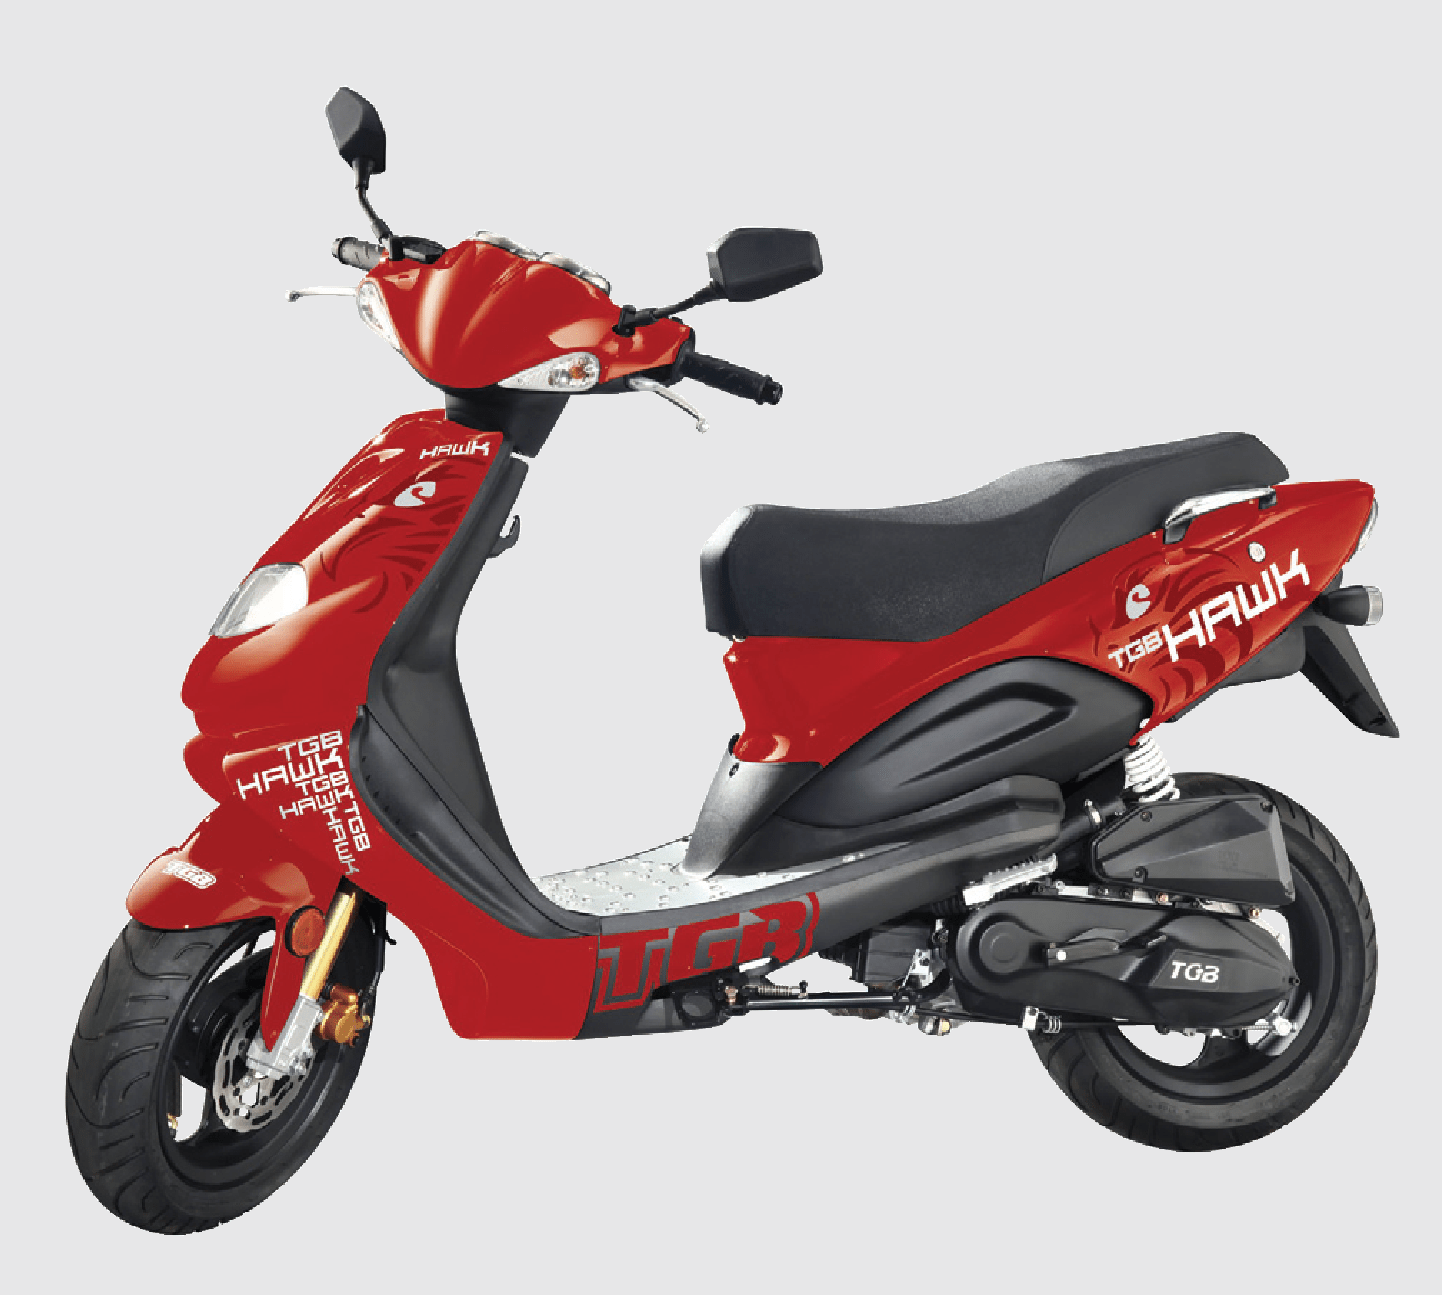 tgb 101s scooter full service repair manual